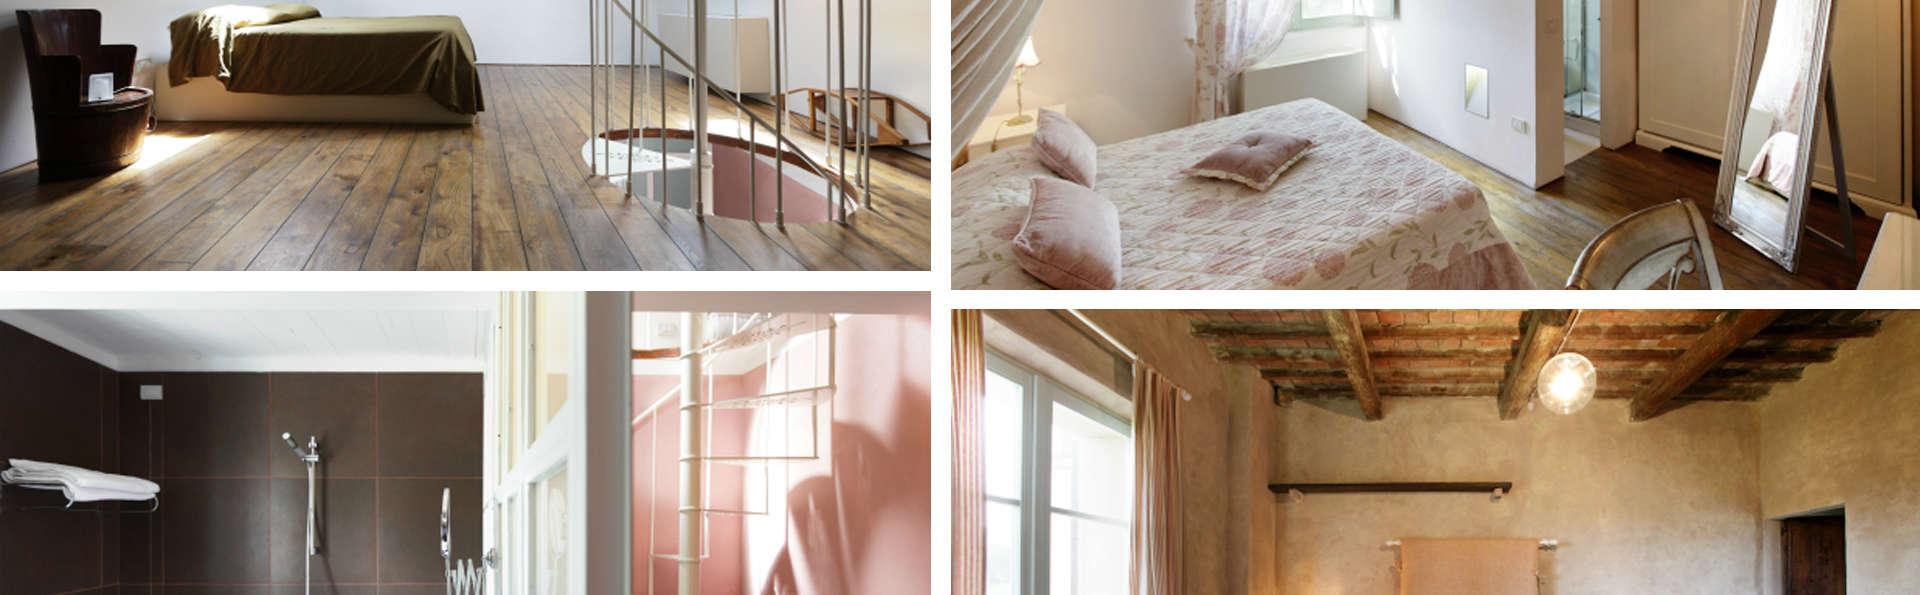 Urbino Resort - Tenuta Santi Giacomo e Filippo - edit_collage_rooms2.jpg